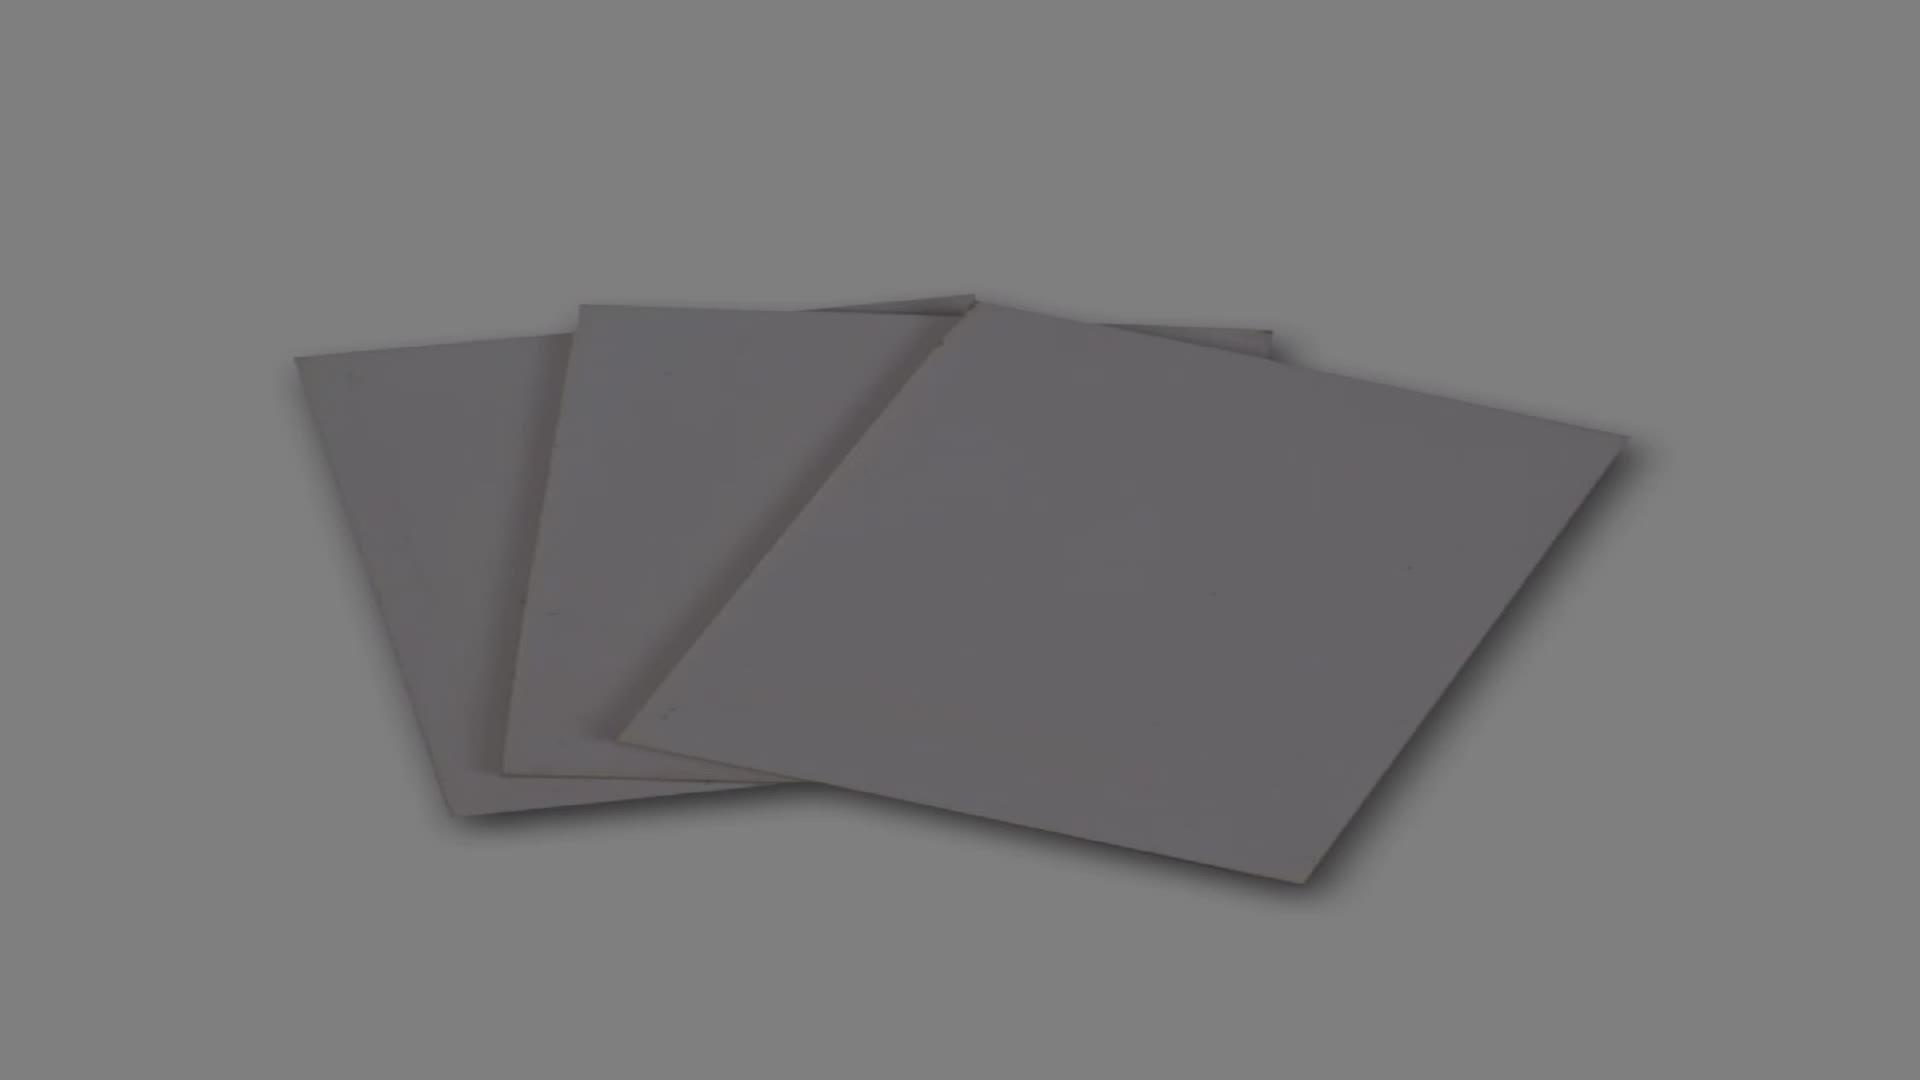 Hohe dichte schwarz wasserdicht pvc laminiert form bord pvc schalung bord pvc panel weiß 6mm